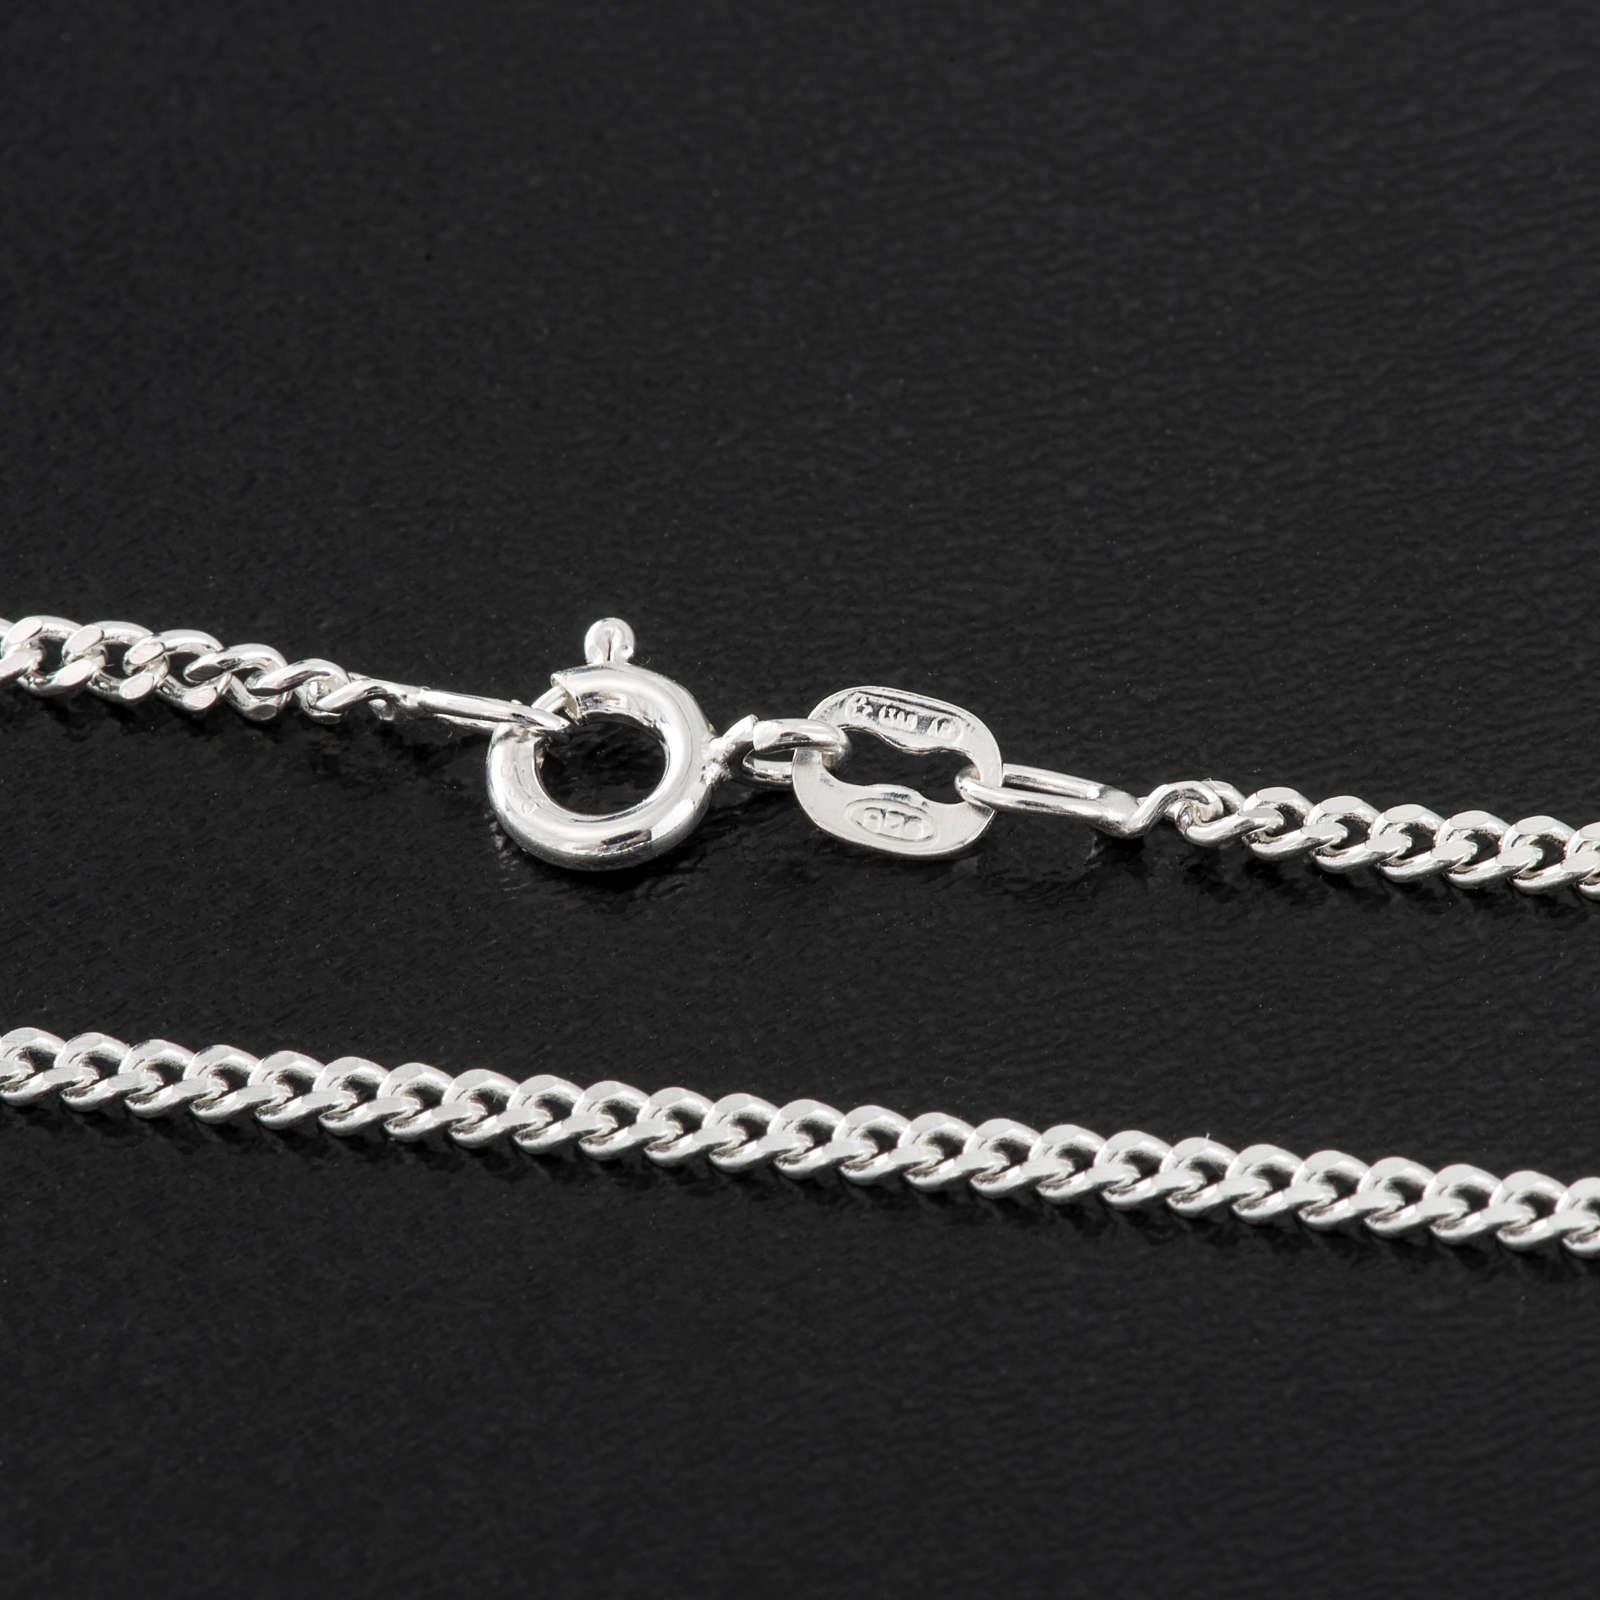 92d6c9a669a5 Cadena de plata 925 de 60cm de largo 4